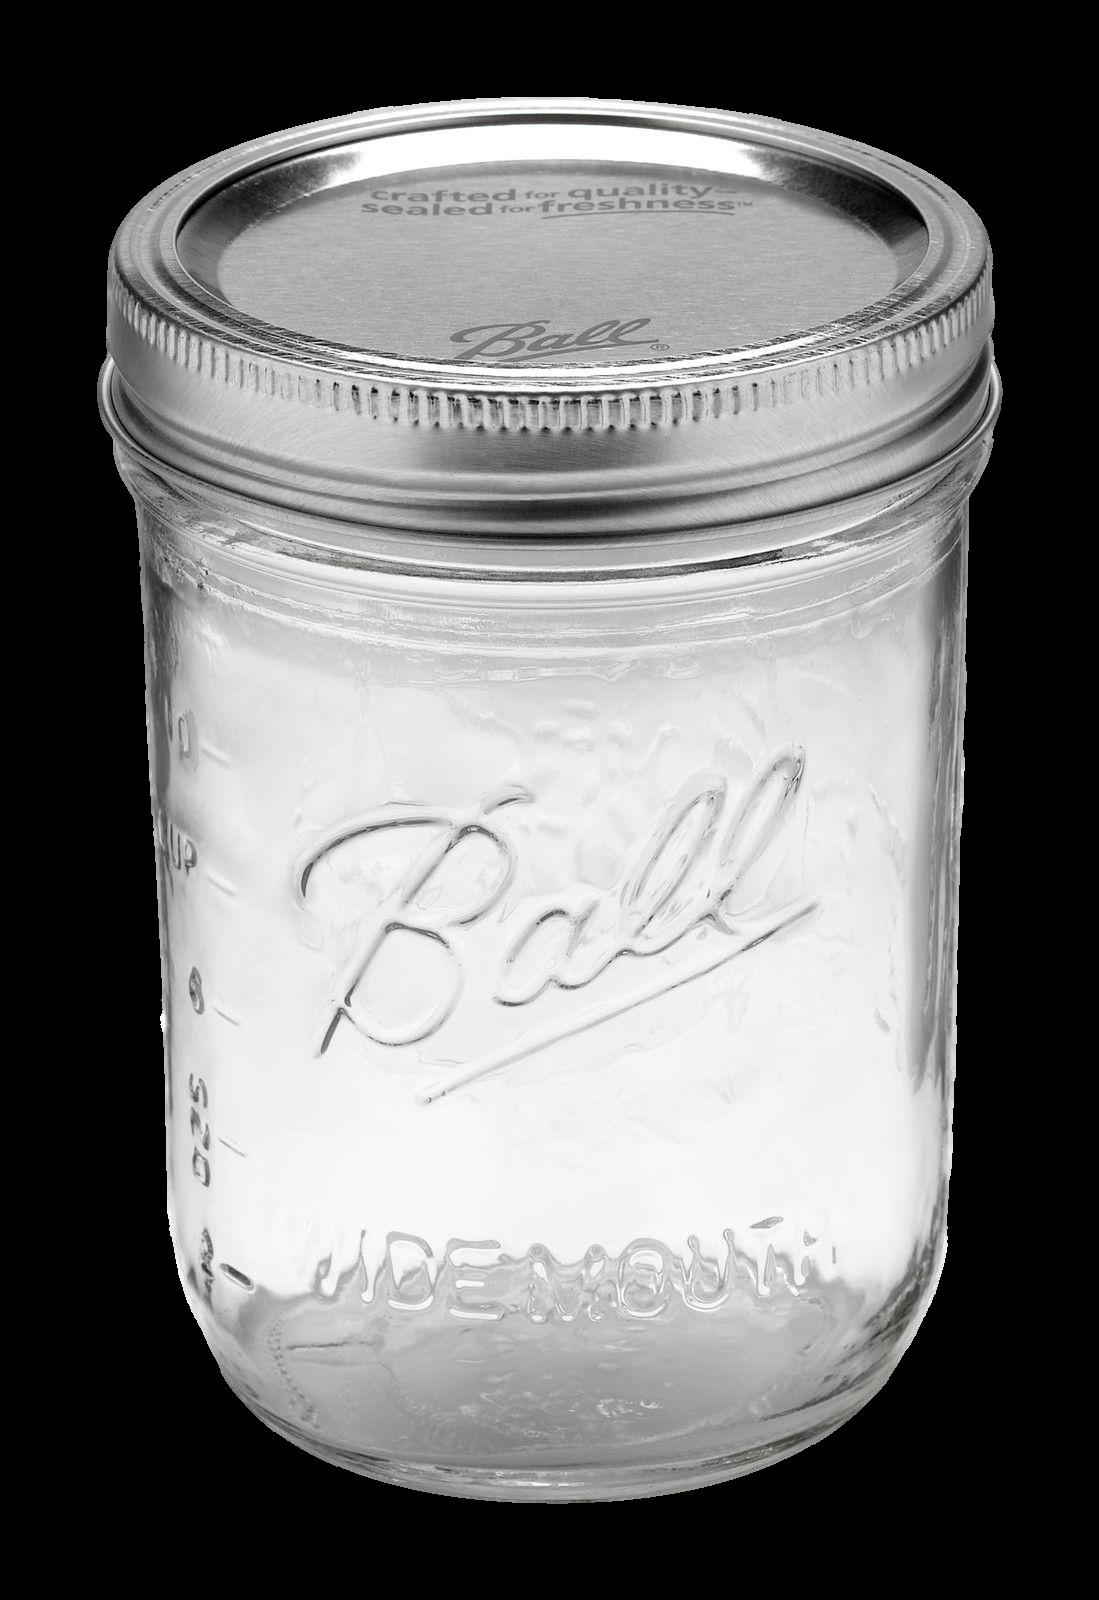 ball-jar-clipped-rev-1.png